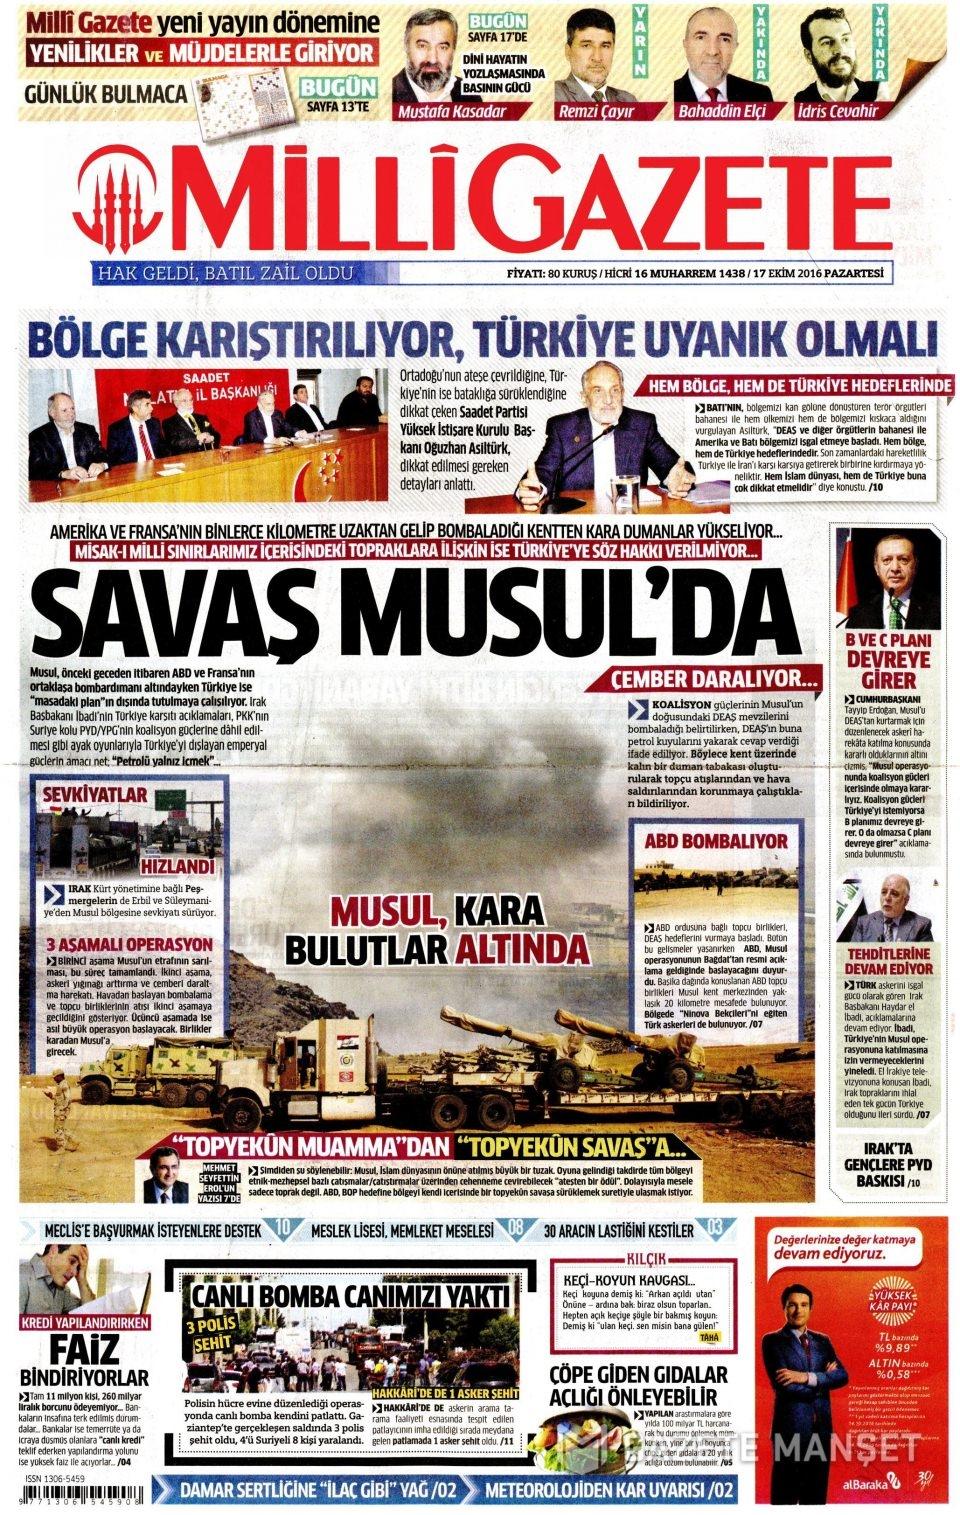 17 Ekim Pazartesi gazete manşetleri 30